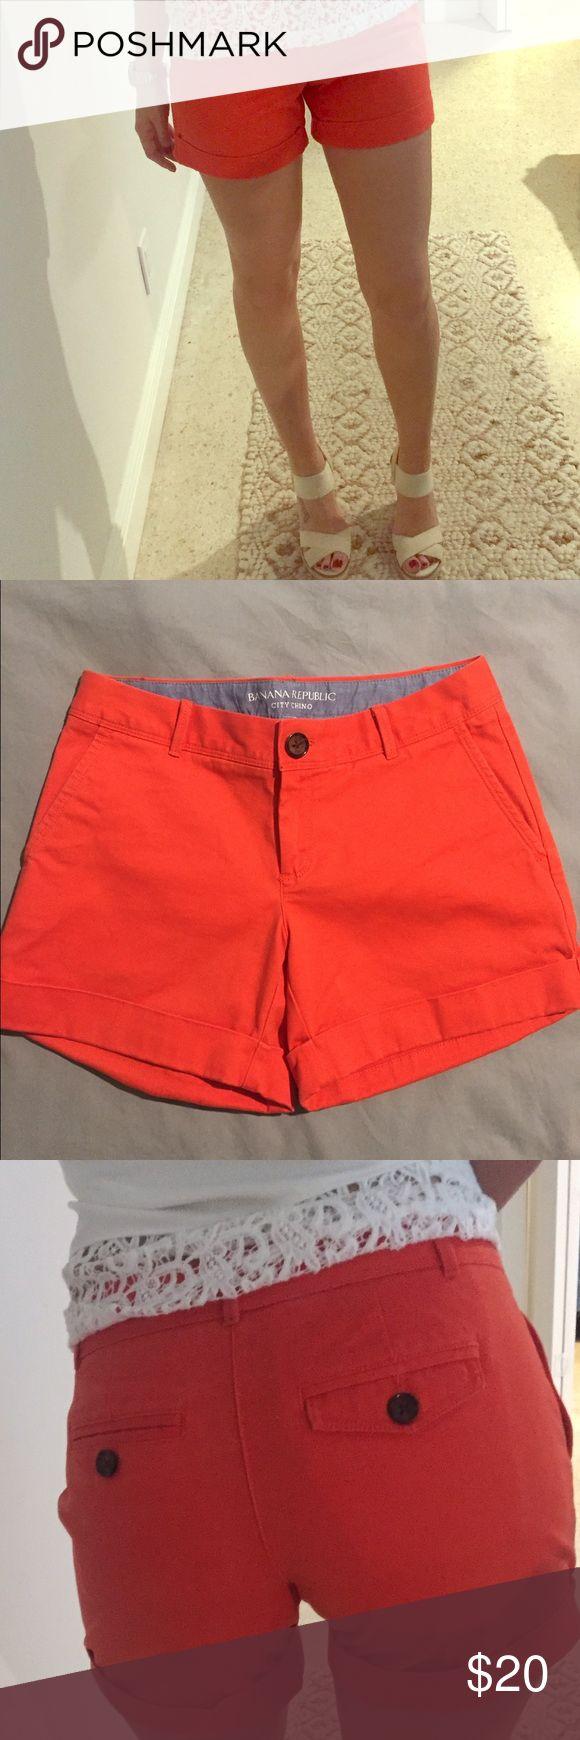 Orange cuffed banana republic shorts Orange cuff chino shorts from Banana Republic Banana Republic Shorts